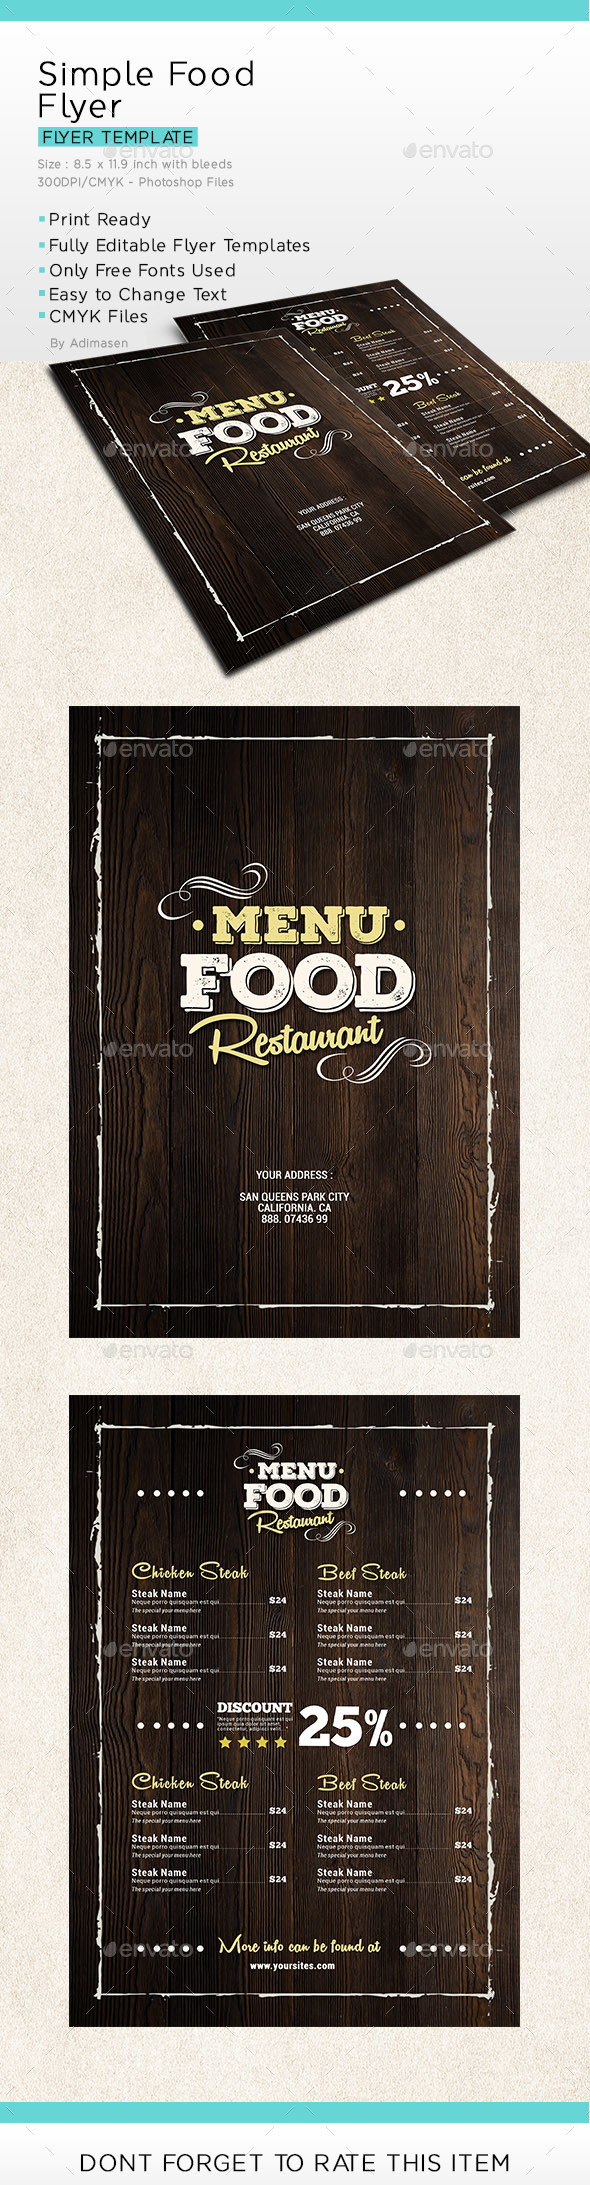 Simple Food Menu Flyer - Food Menus Print Templates